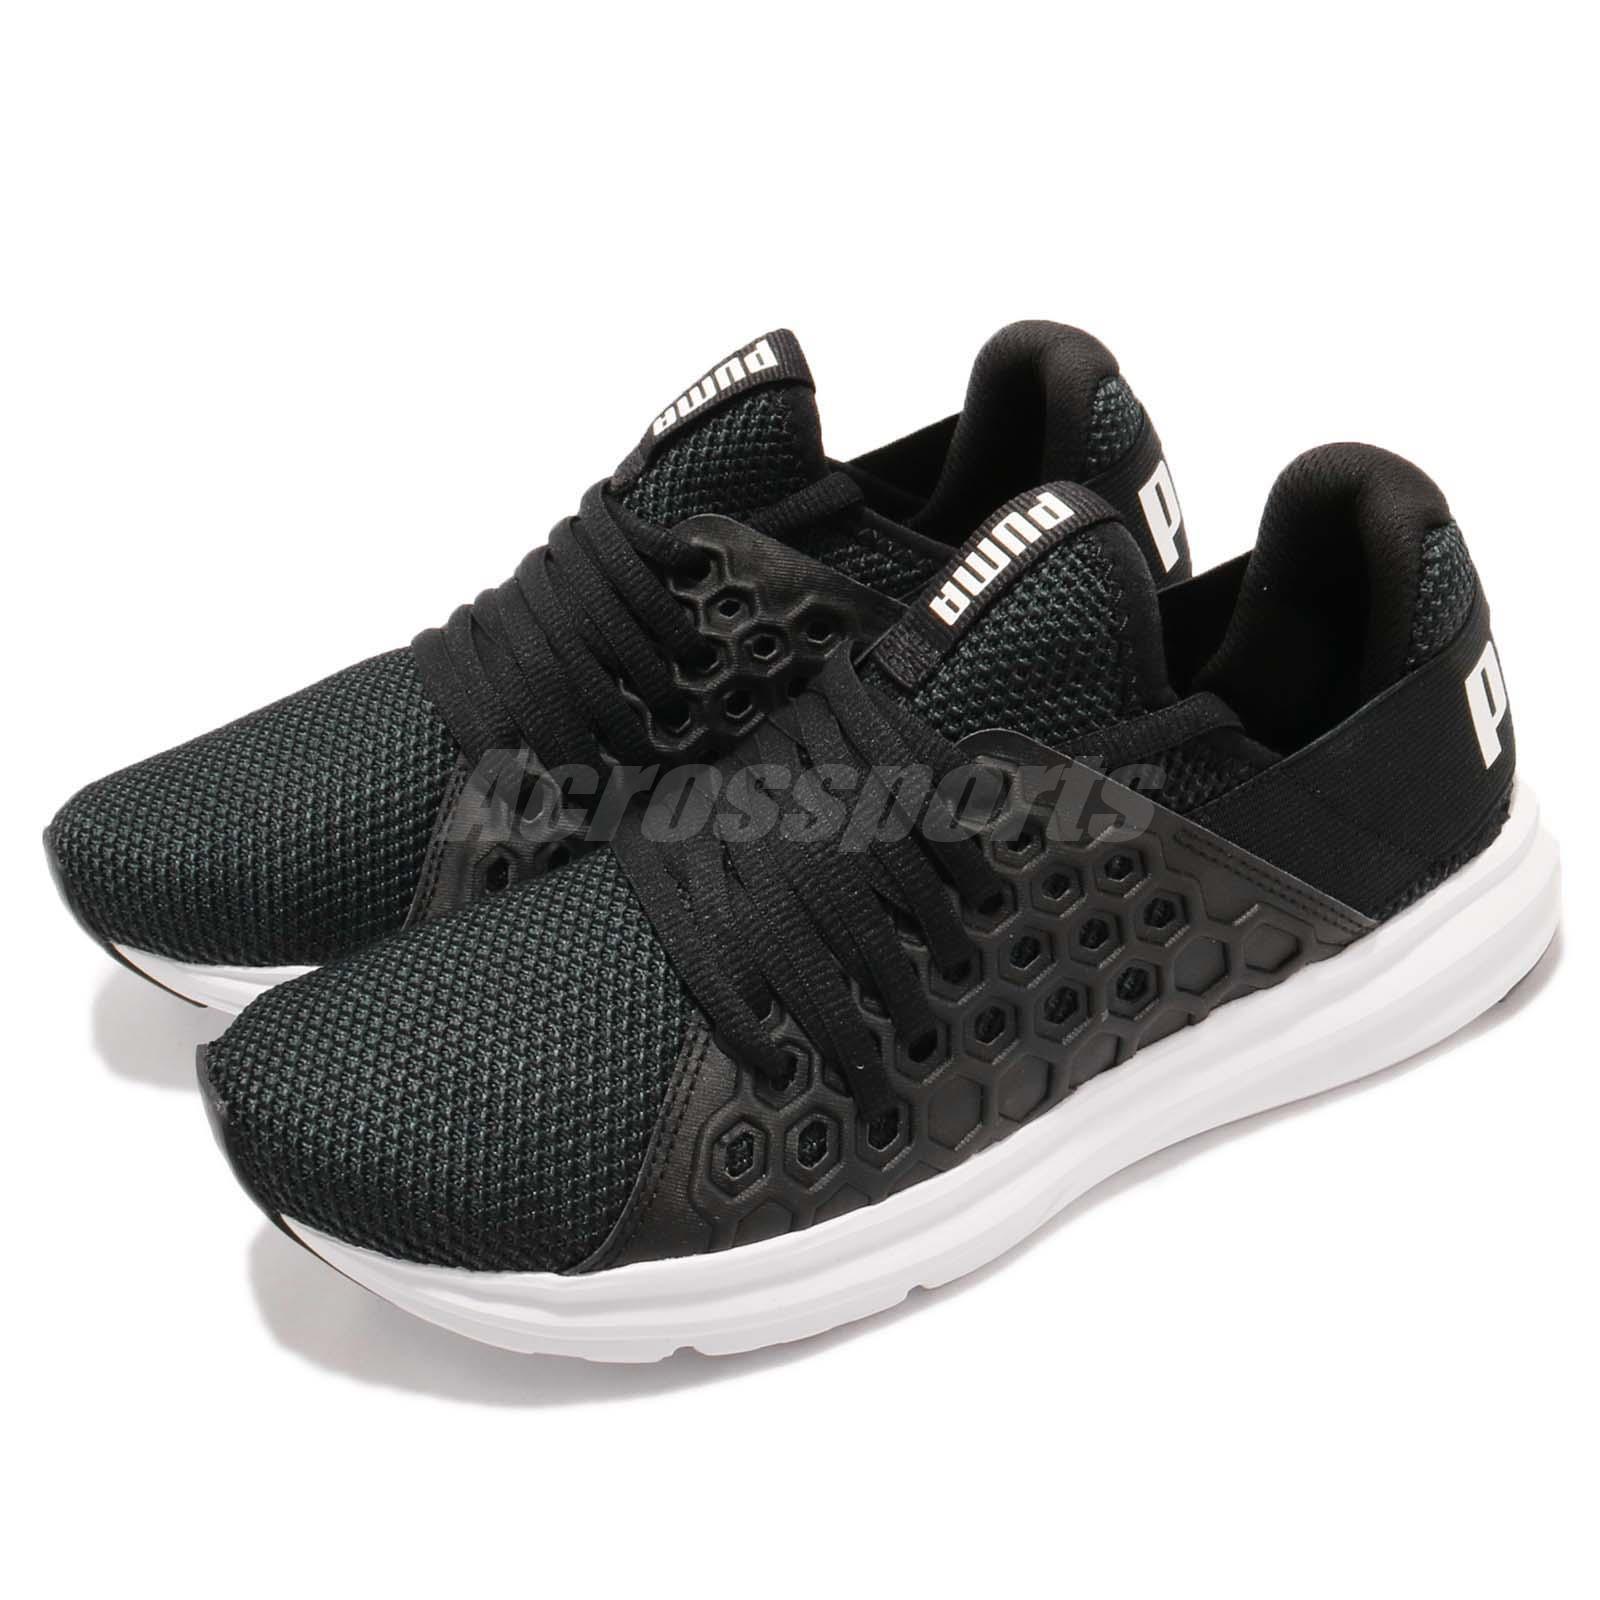 Puma Enzo NF Black White Men Lifestyle Fashion Running Shoes Sneakers 190932 01